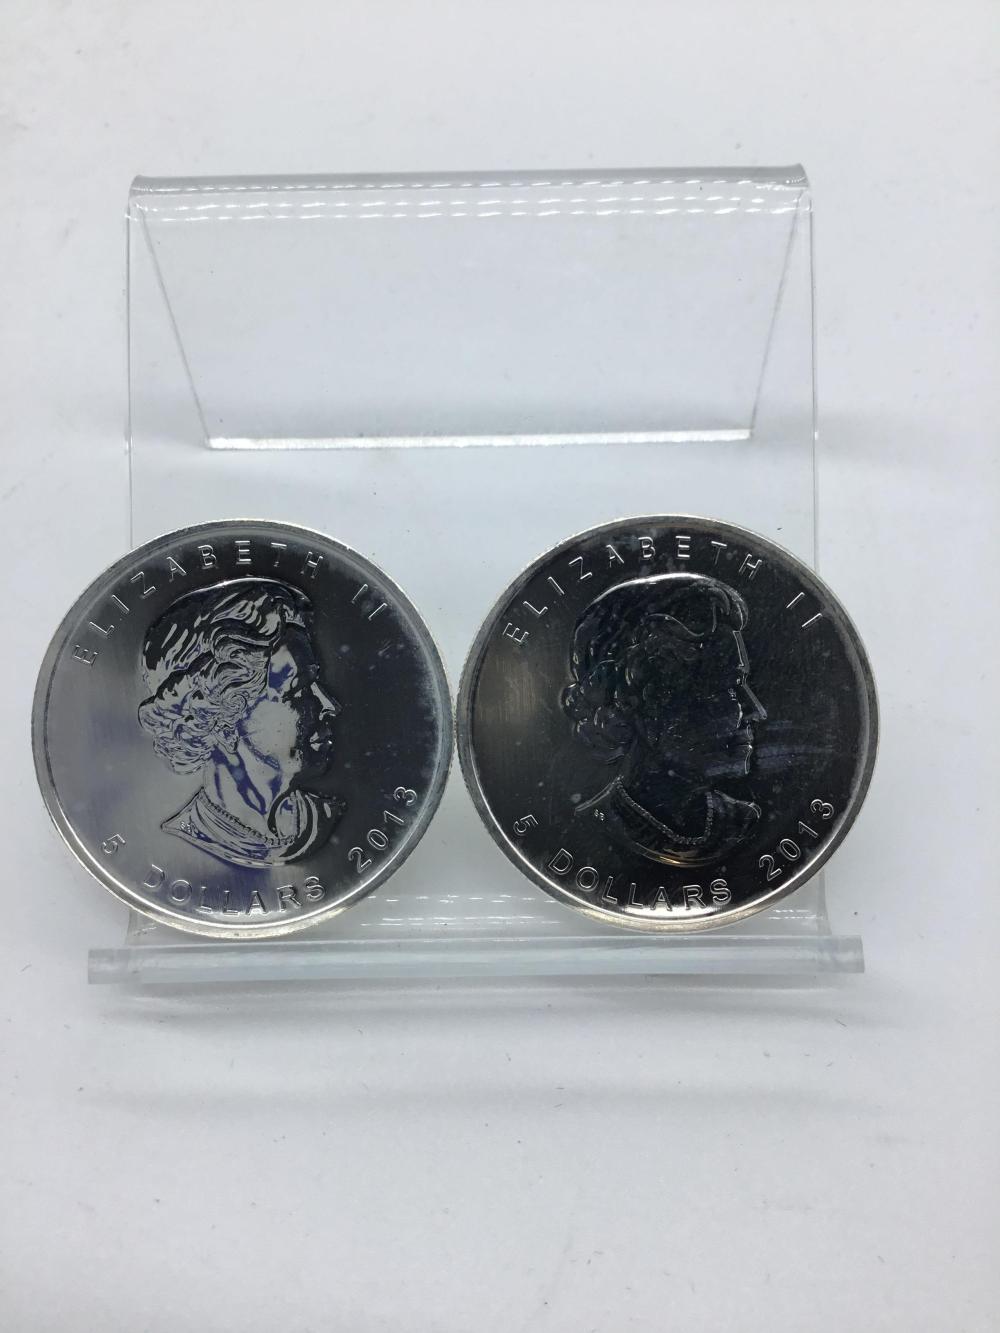 2013 Canadian $5 1oz fine silver coin